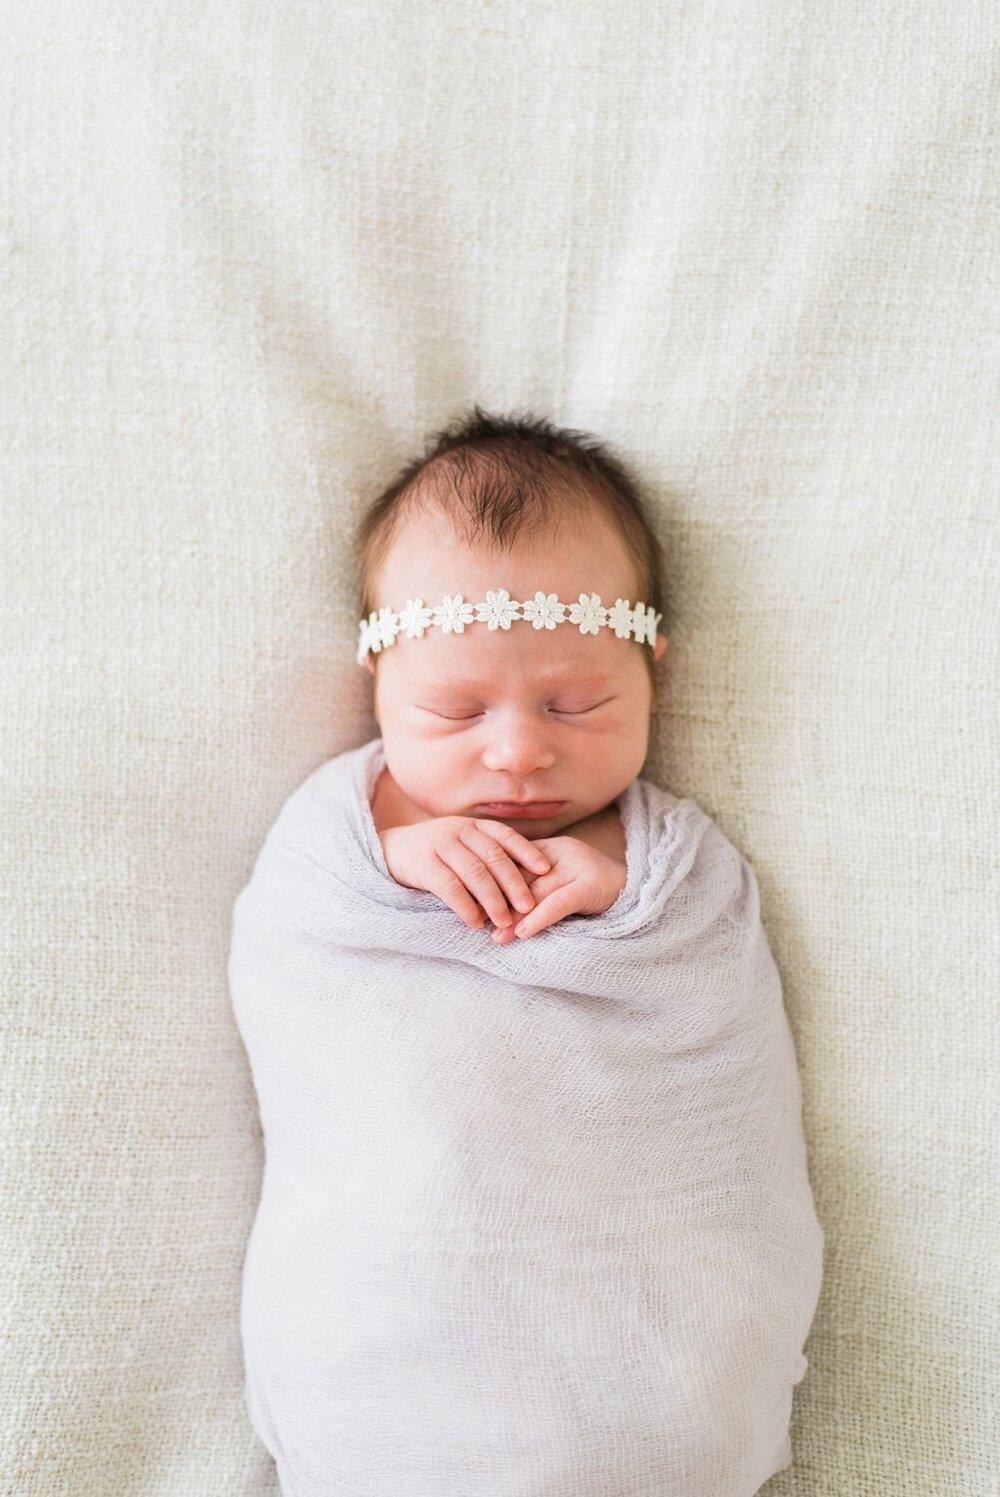 portland-newborn-photography-chinn-family-shelley-marie-photo-208_cr.jpg